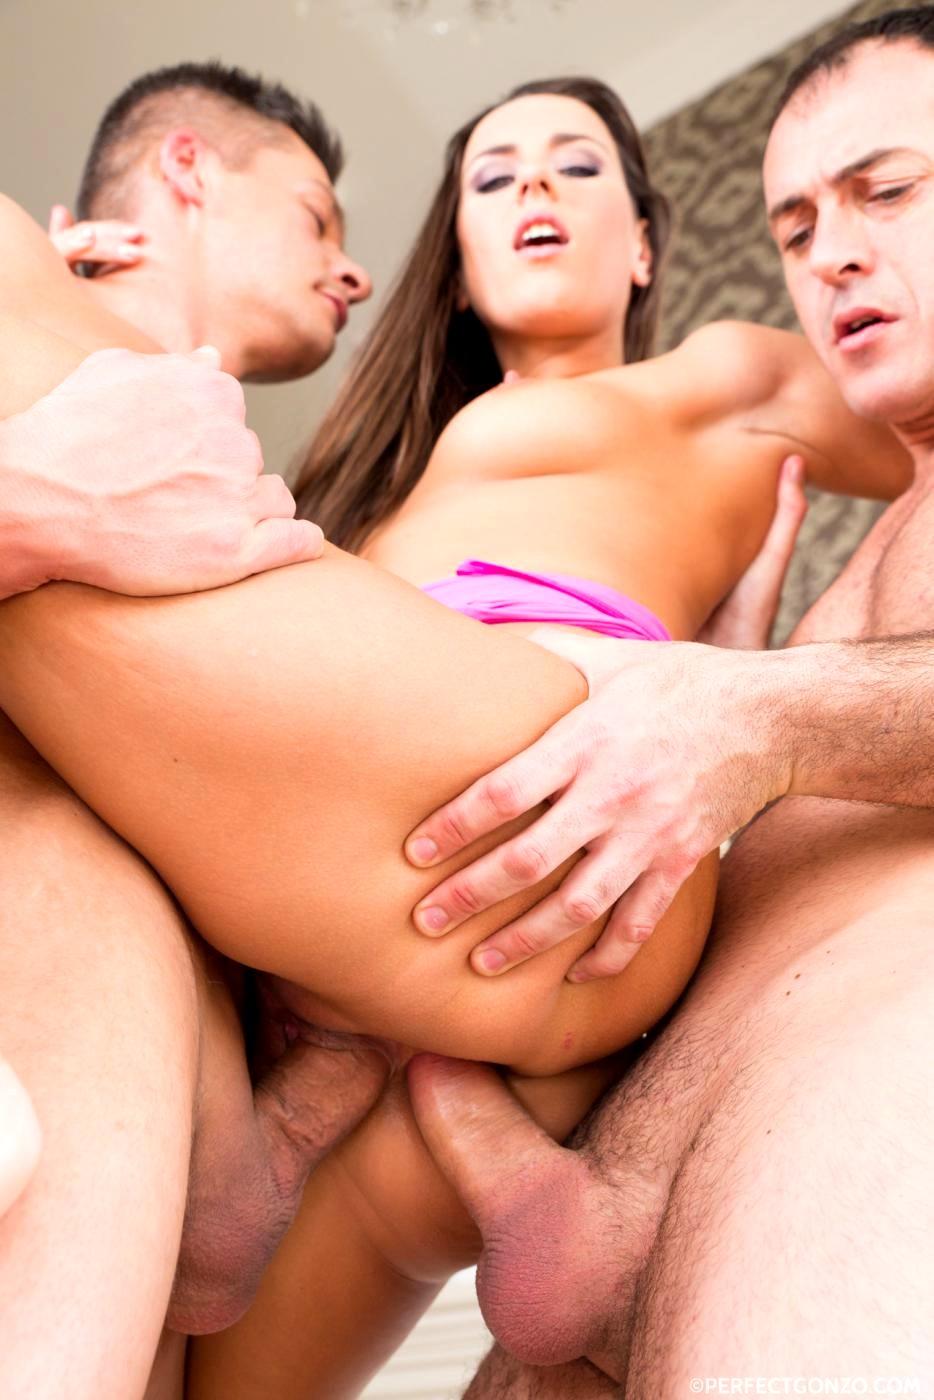 Anal Porn Trex allinternal mea melone passsex anal sex porntrex free